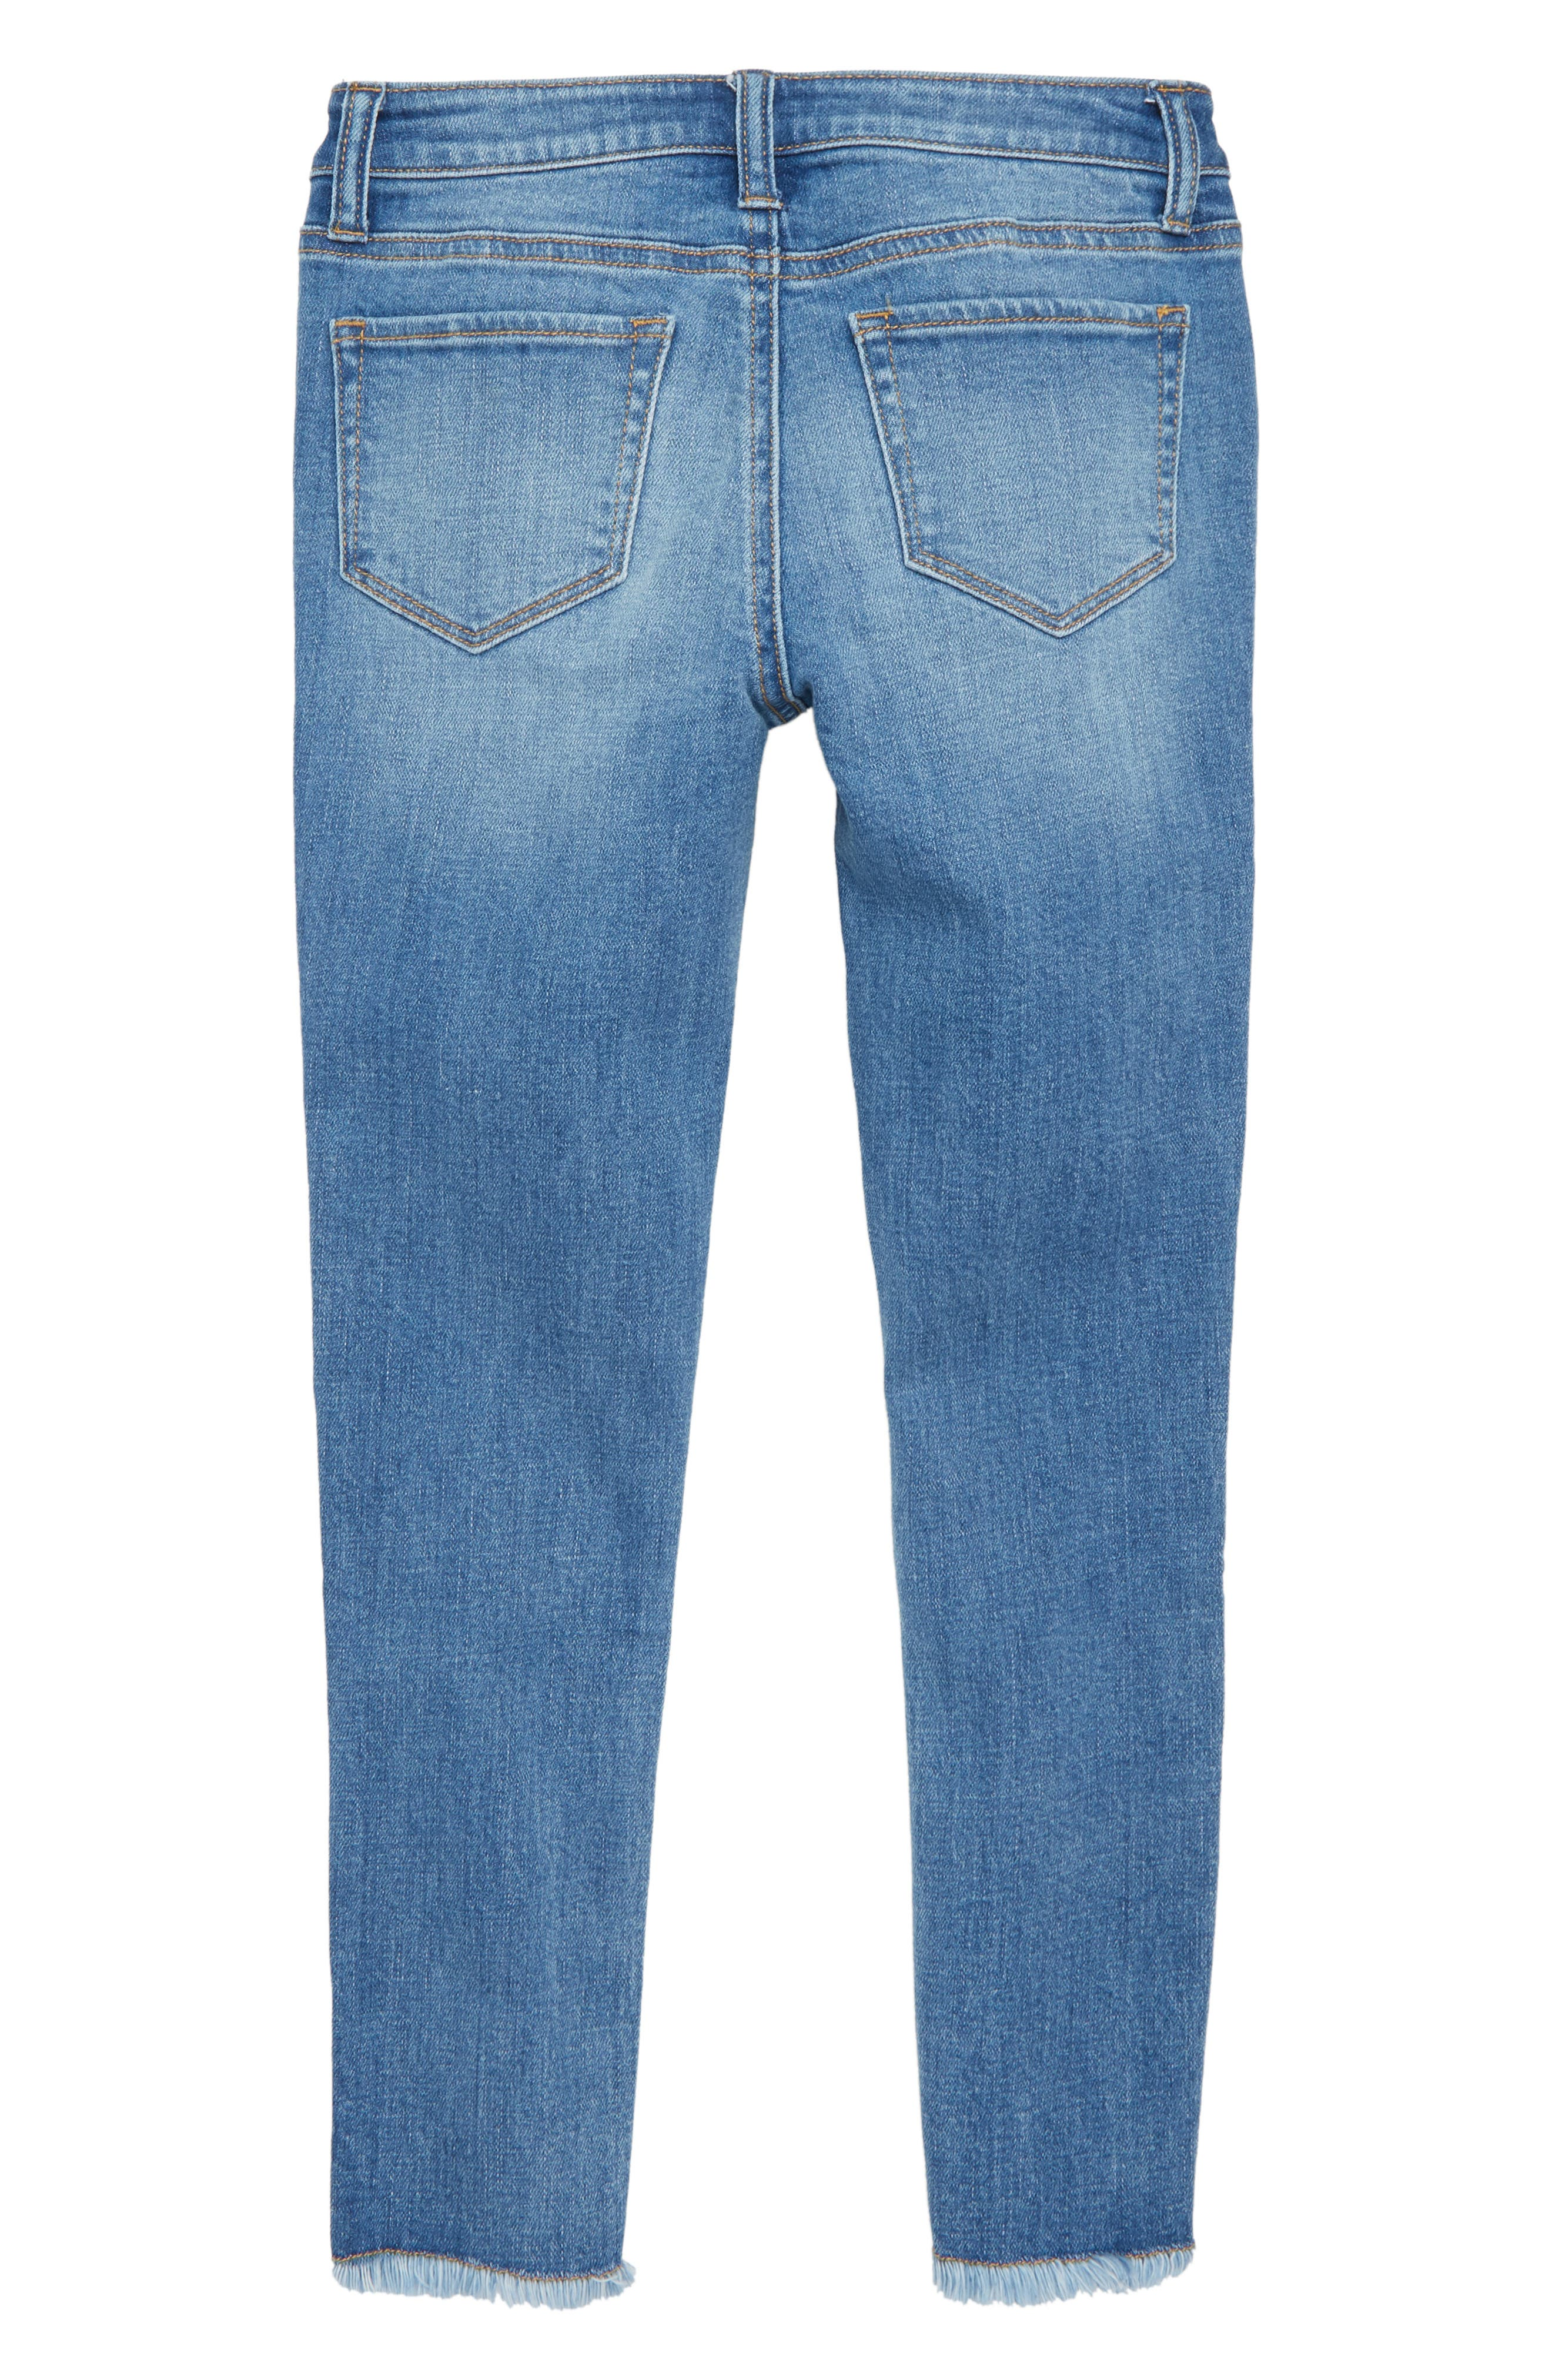 Embroidered Fray Hem Skinny Jeans,                             Alternate thumbnail 2, color,                             420